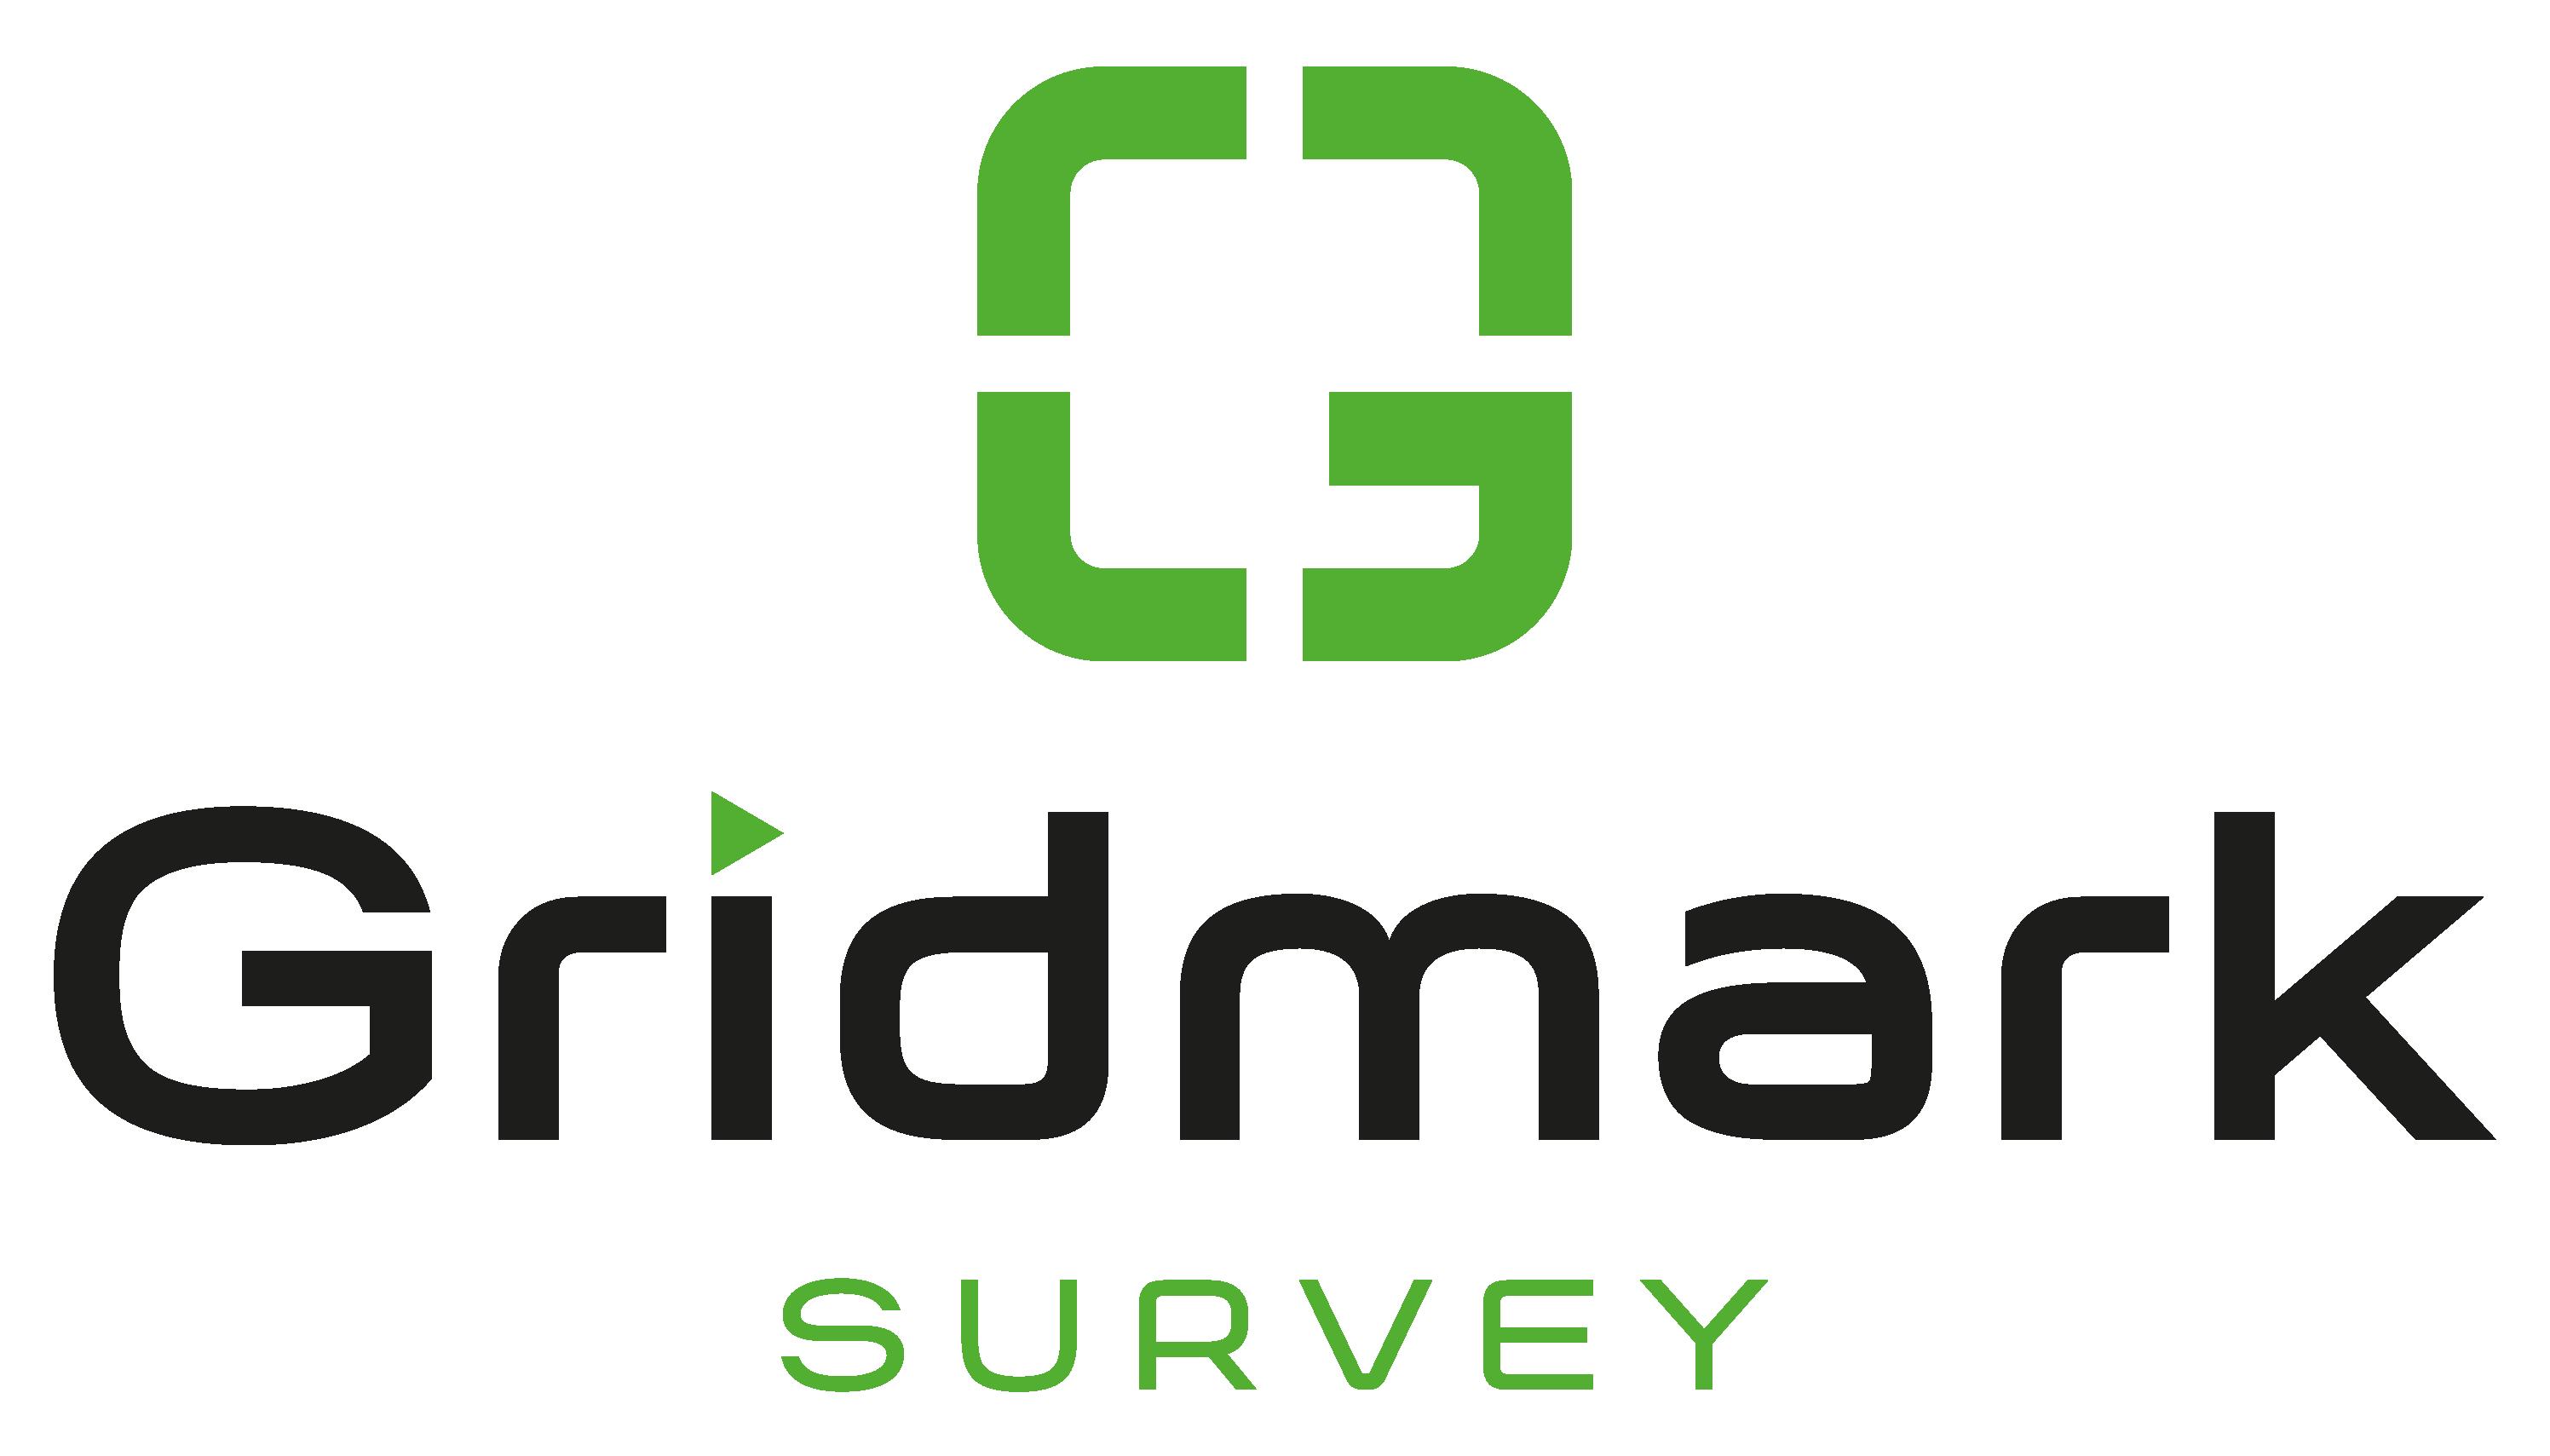 Gridmark Survey Limited